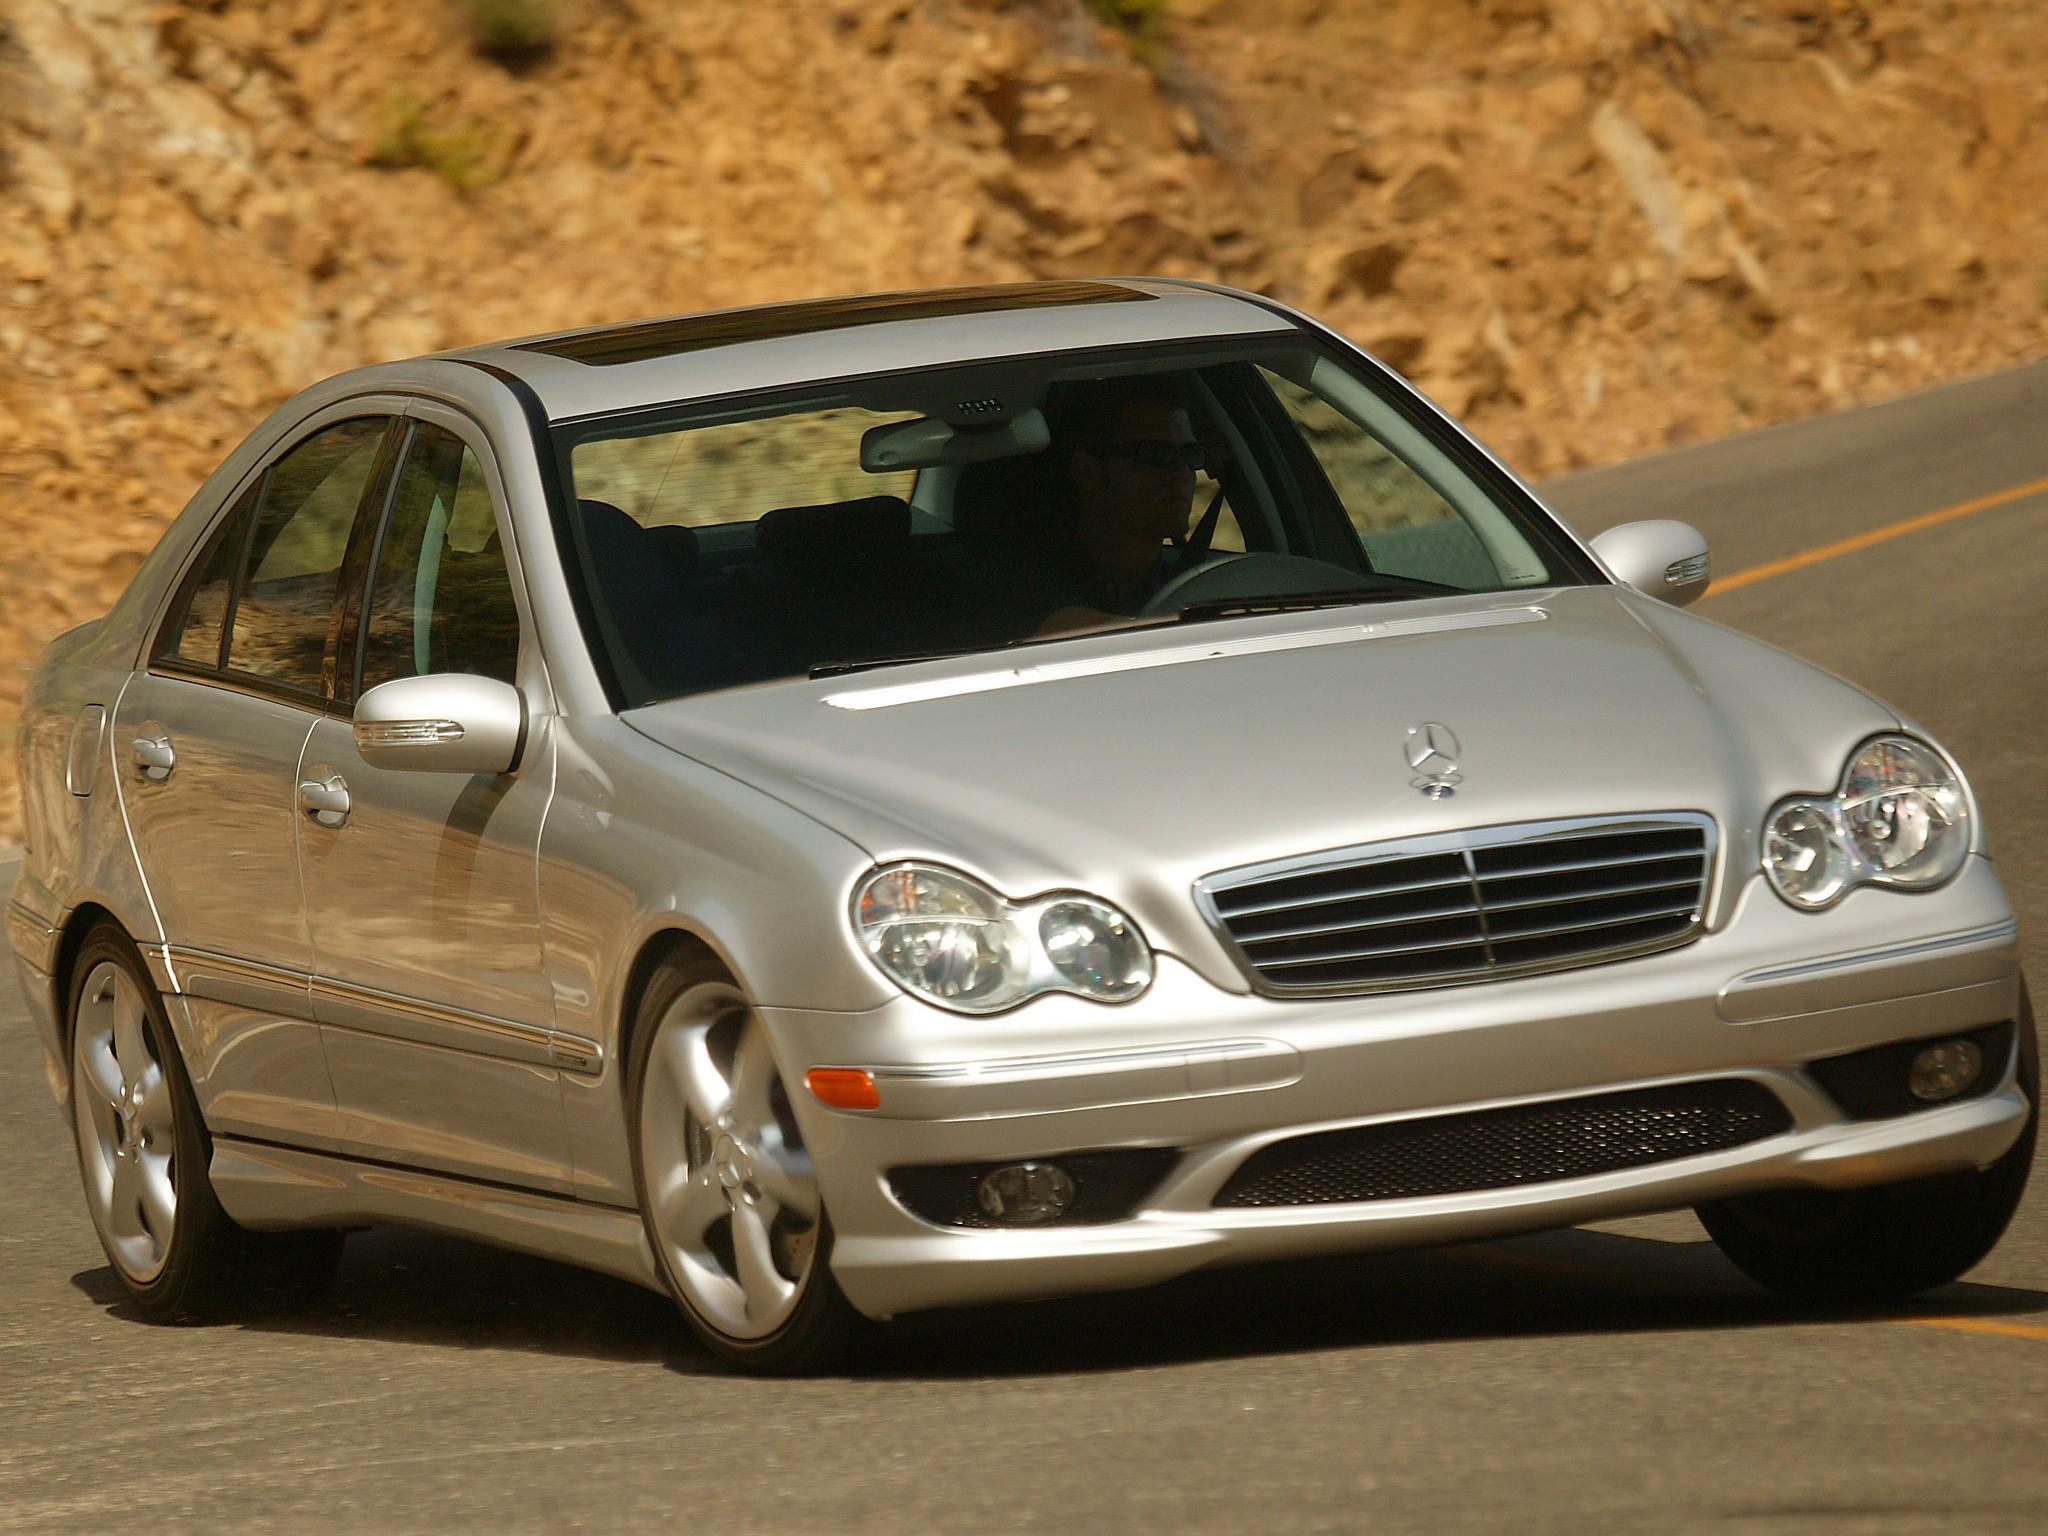 Mercedes Benz C Klasse W203 Specs Amp Photos 2004 2005